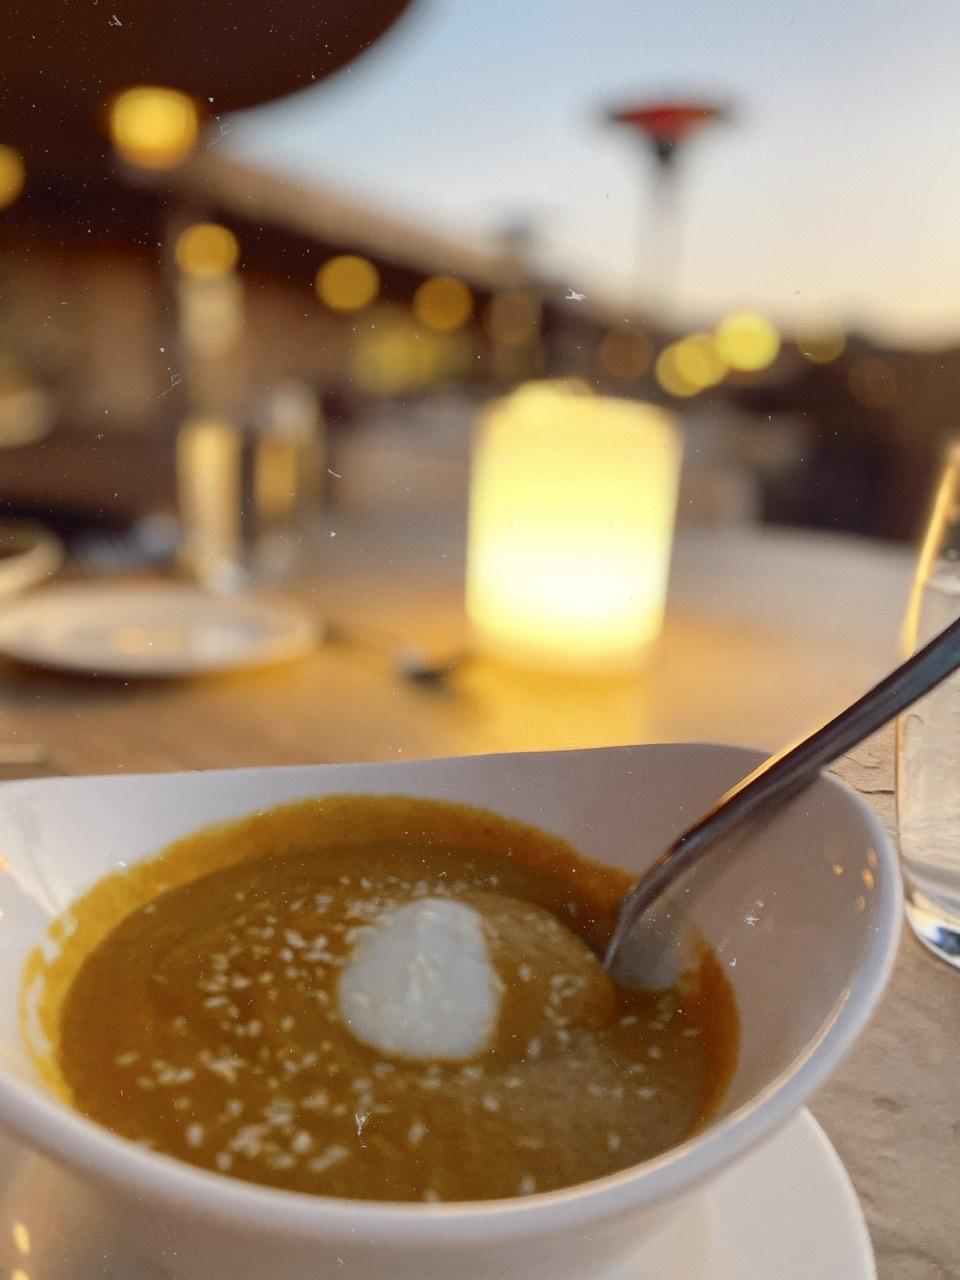 Butternut squash soup at Terras restaurant at Civana Wellness resort on the outdoor patio